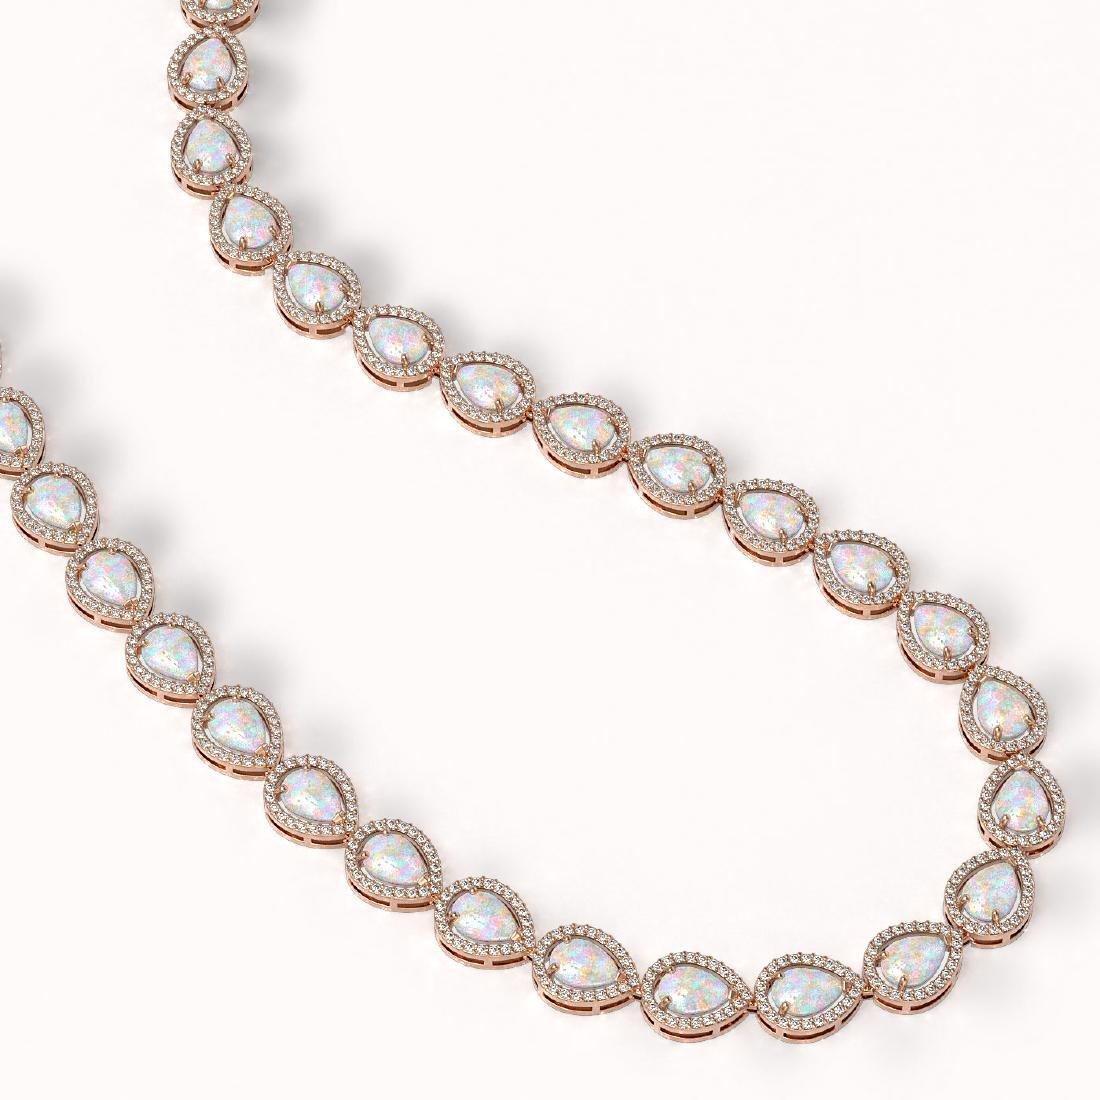 27.93 CTW Opal & Diamond Halo Necklace 10K Rose Gold - 2